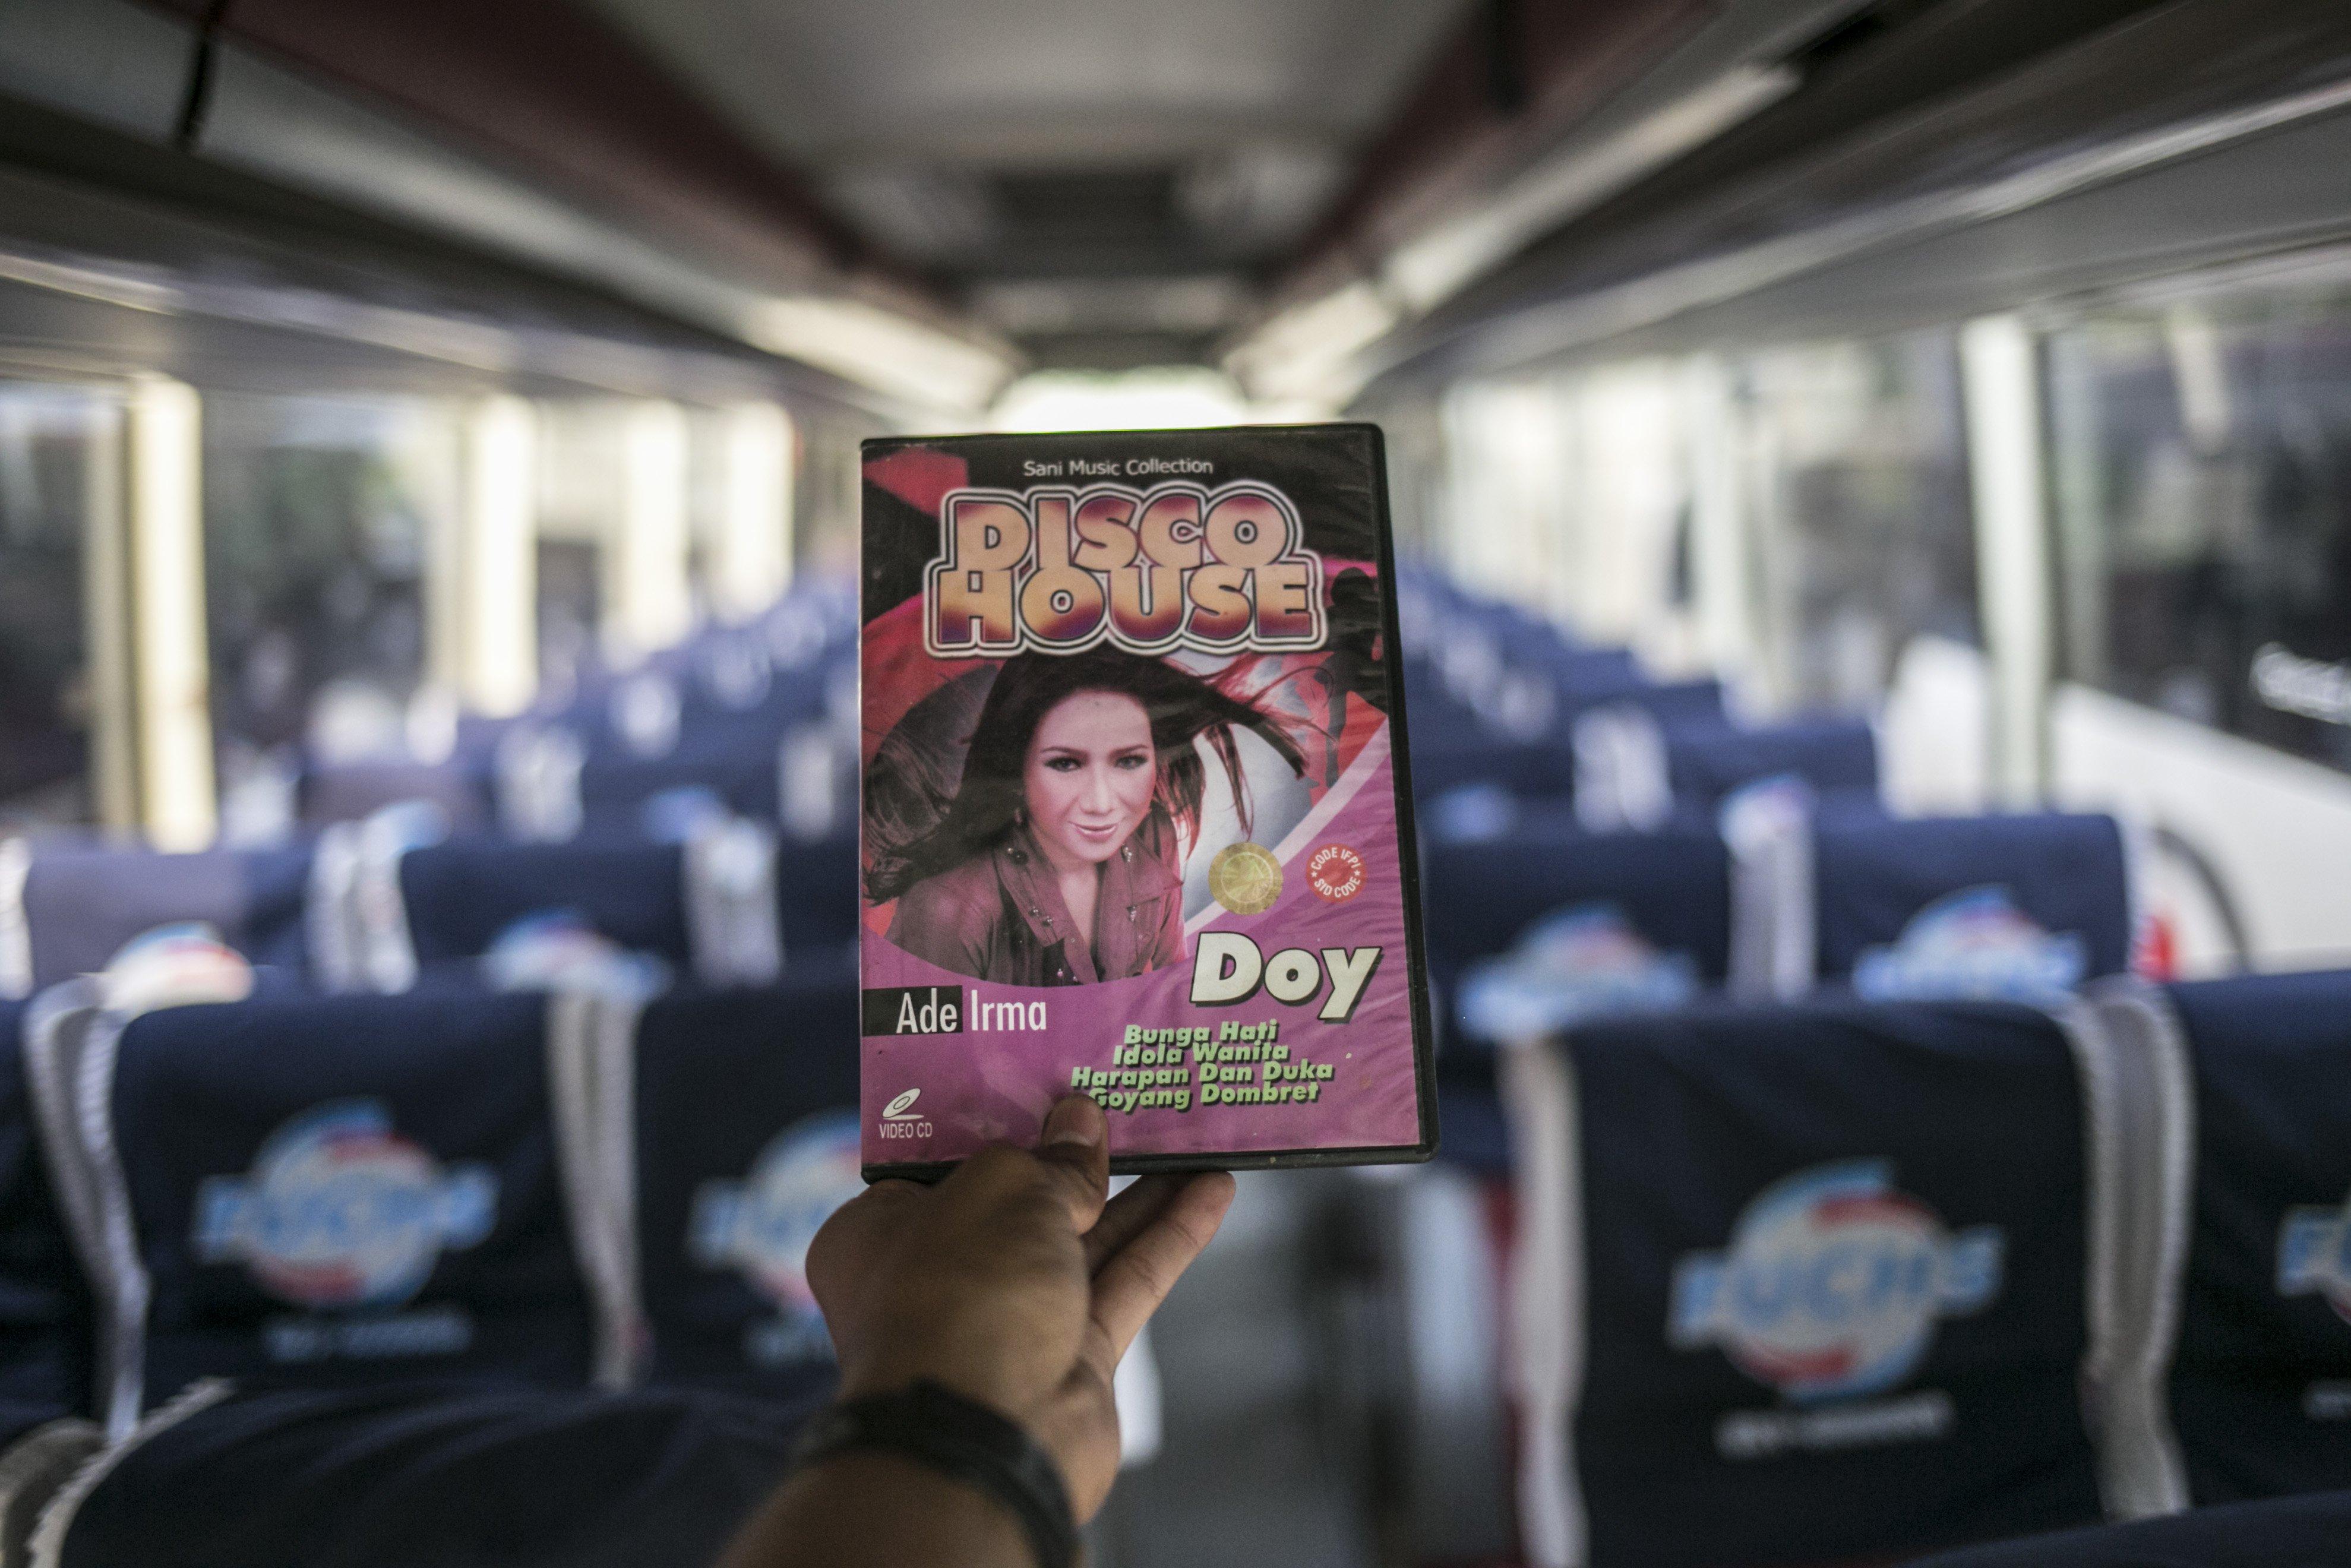 Kaset hiburan yang biasa di putar dalam berdalanan di salah satu pool bus pariwisata di kawasan Tanjung Barat, Jagakarsa, Jakarta, Selasa (28/7/2020). Masih diberlakukannya Pembatasan Sosial Bersekala Besar (PSBB) dan penutupan tempat rekreasi akibat Covid-19, berimbas pada jasa transportasi pariwisata. Sejak bulan Maret pengelola mengaku mengalami penurunan pendapatan dan penyewaan bus hingga 80%.